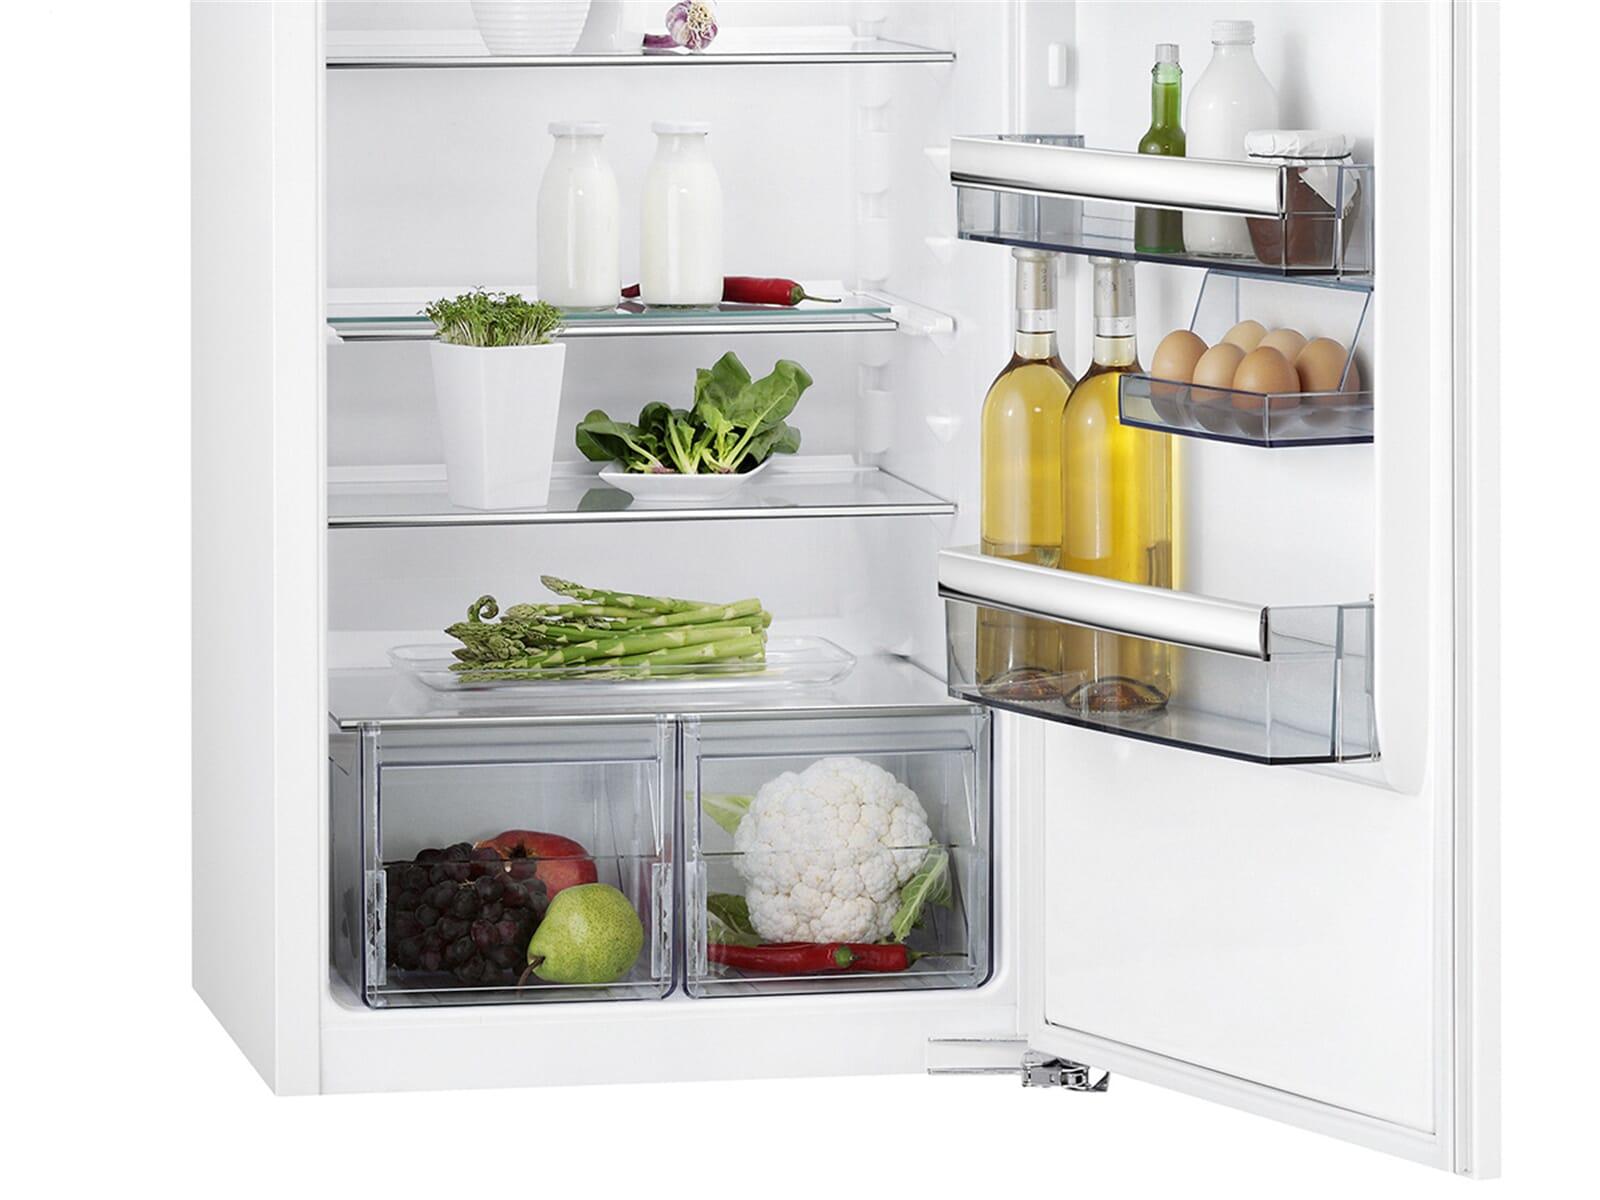 Aeg Kühlschrank Coolmatic Bedienungsanleitung : Aeg sfe ac einbaukühlschrank